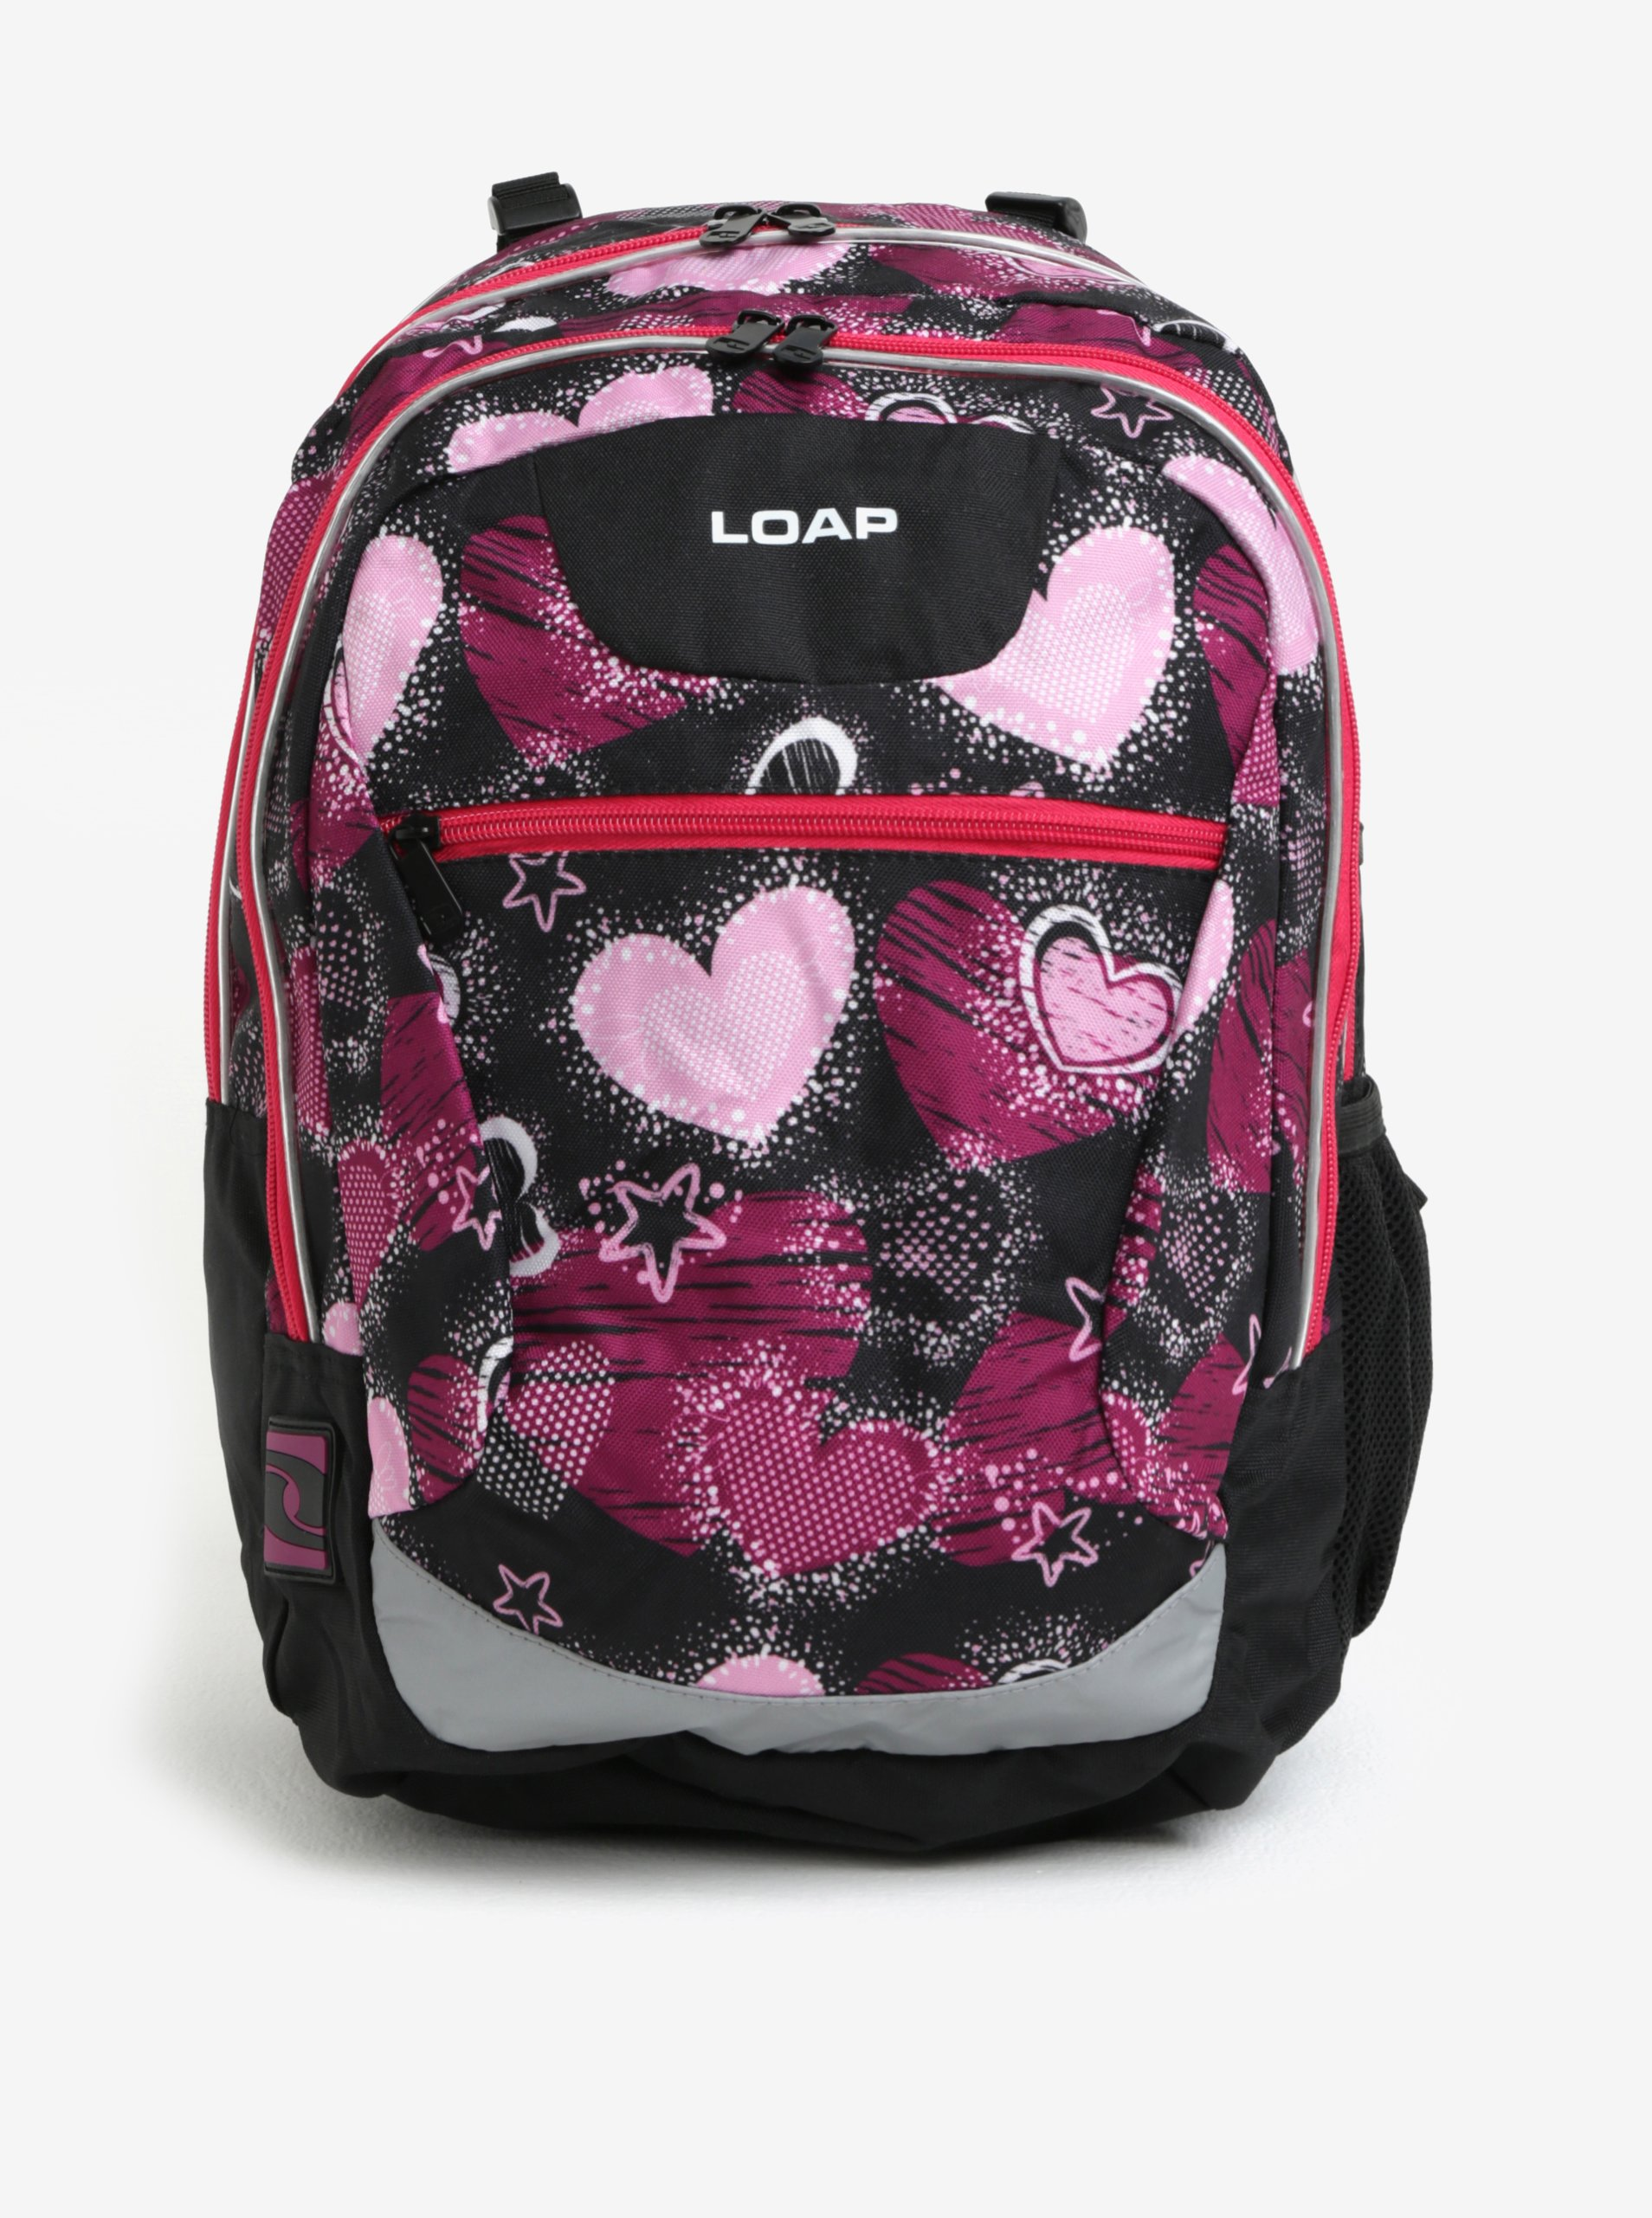 Černo-růžový holčičí vzorovaný batoh LOAP Ellipse 25 l 86a2f41e42